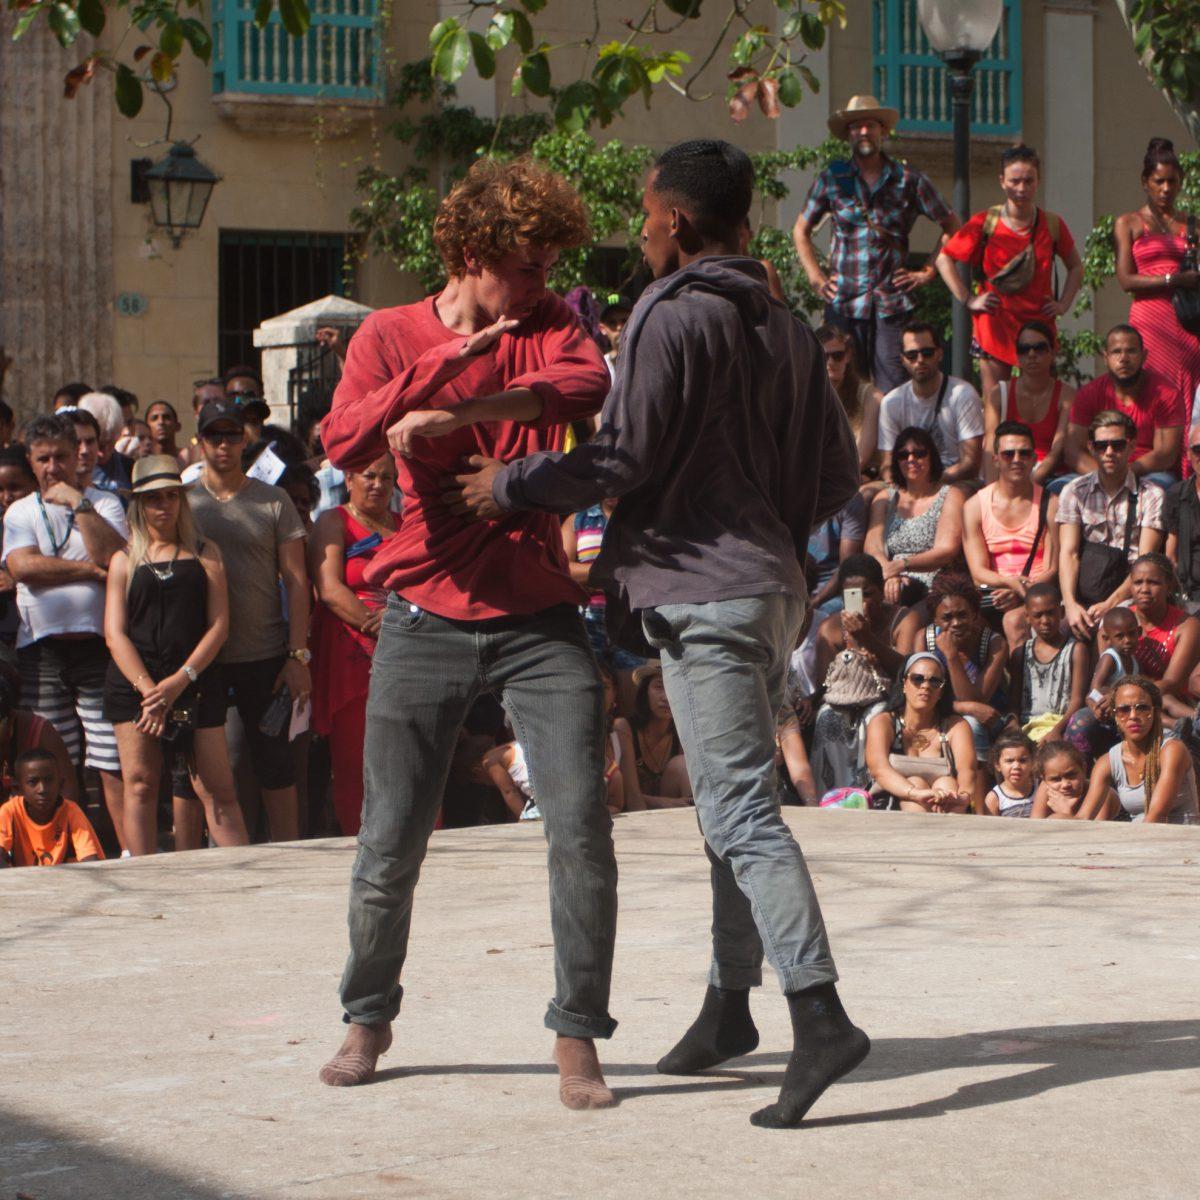 people, dance